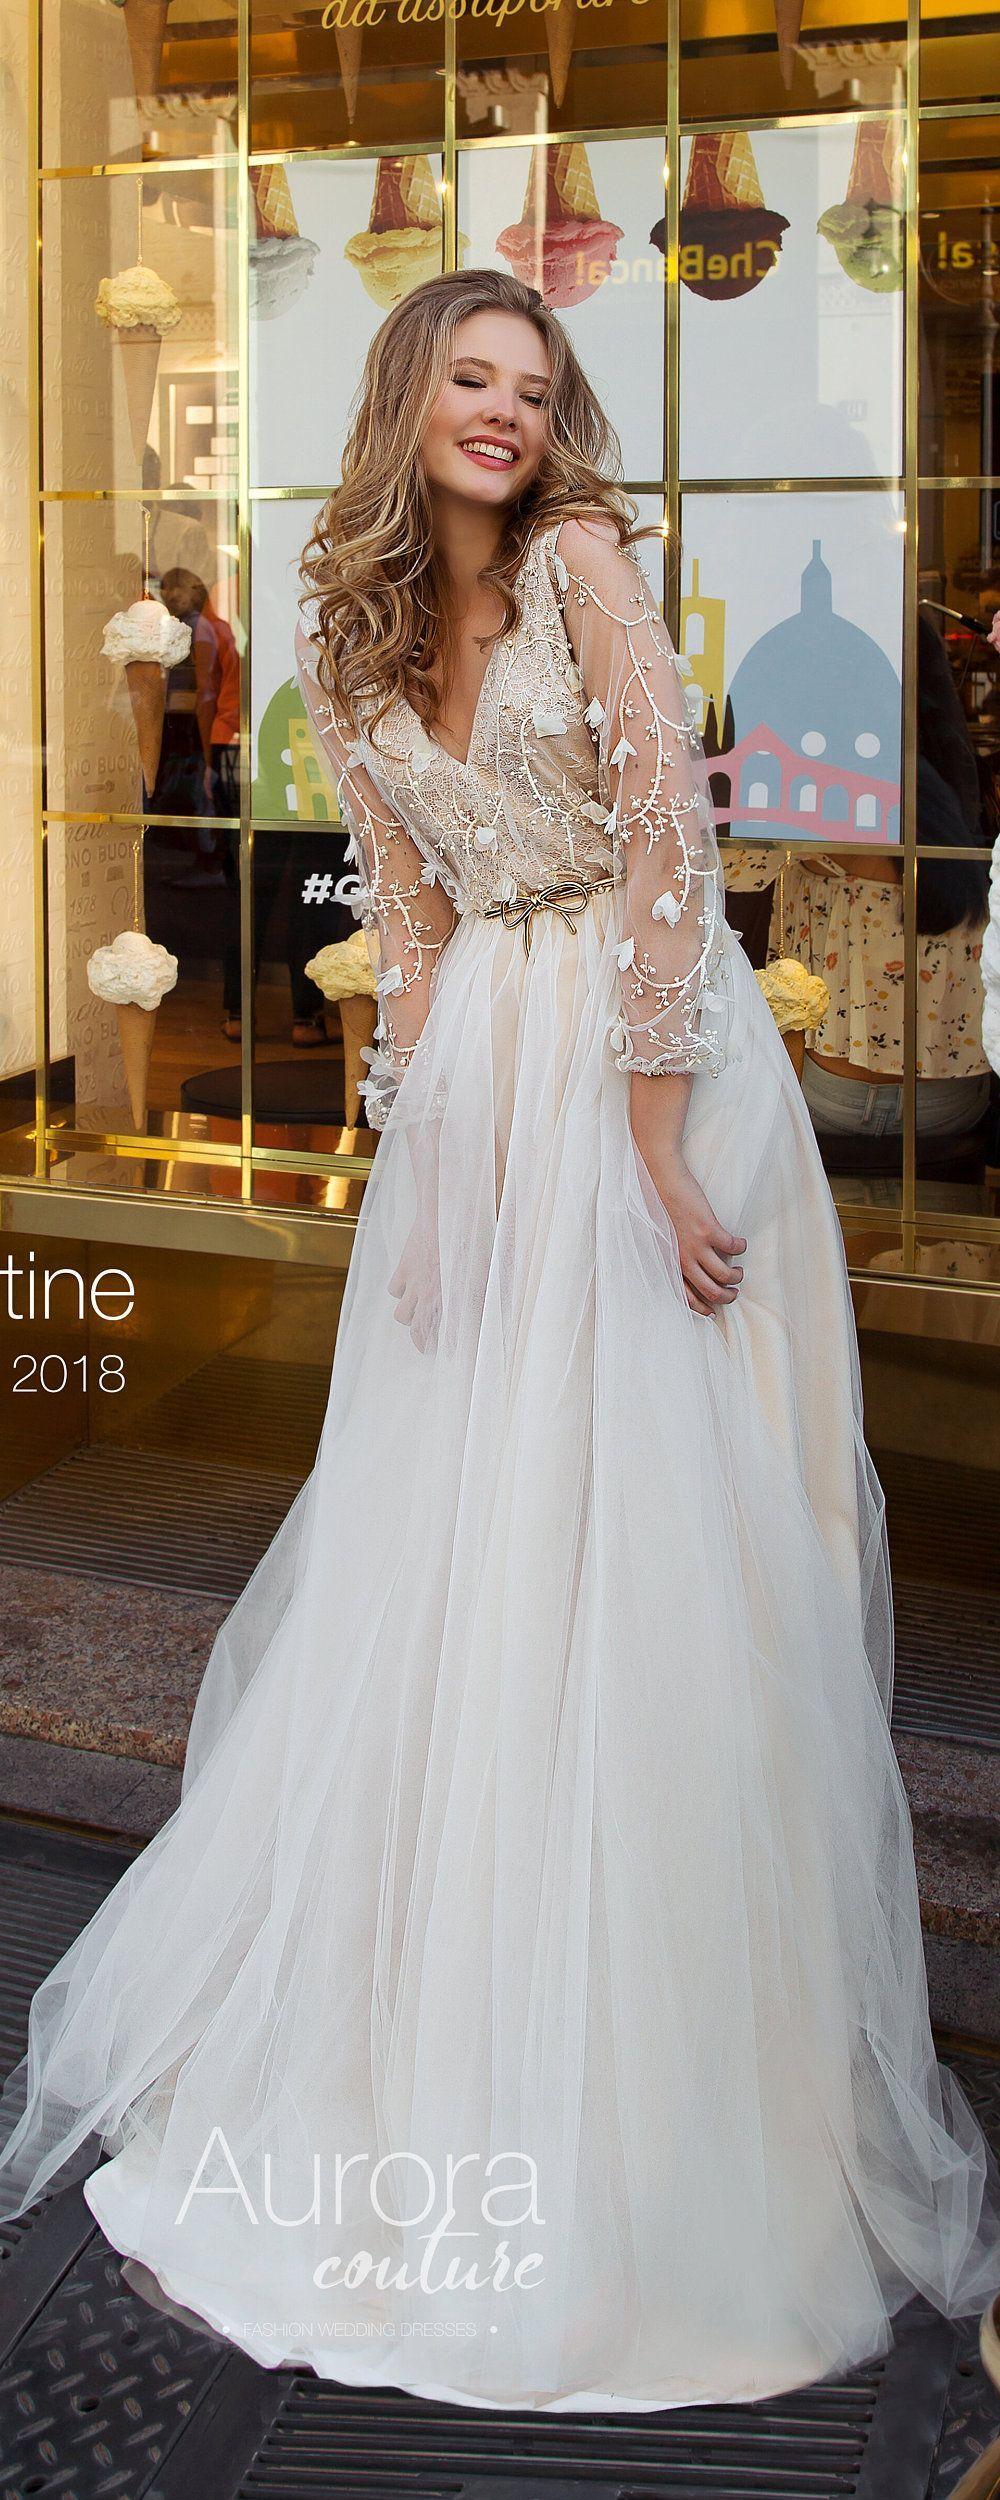 Bohemian wedding dress wedding dress long sleeve wedding dress